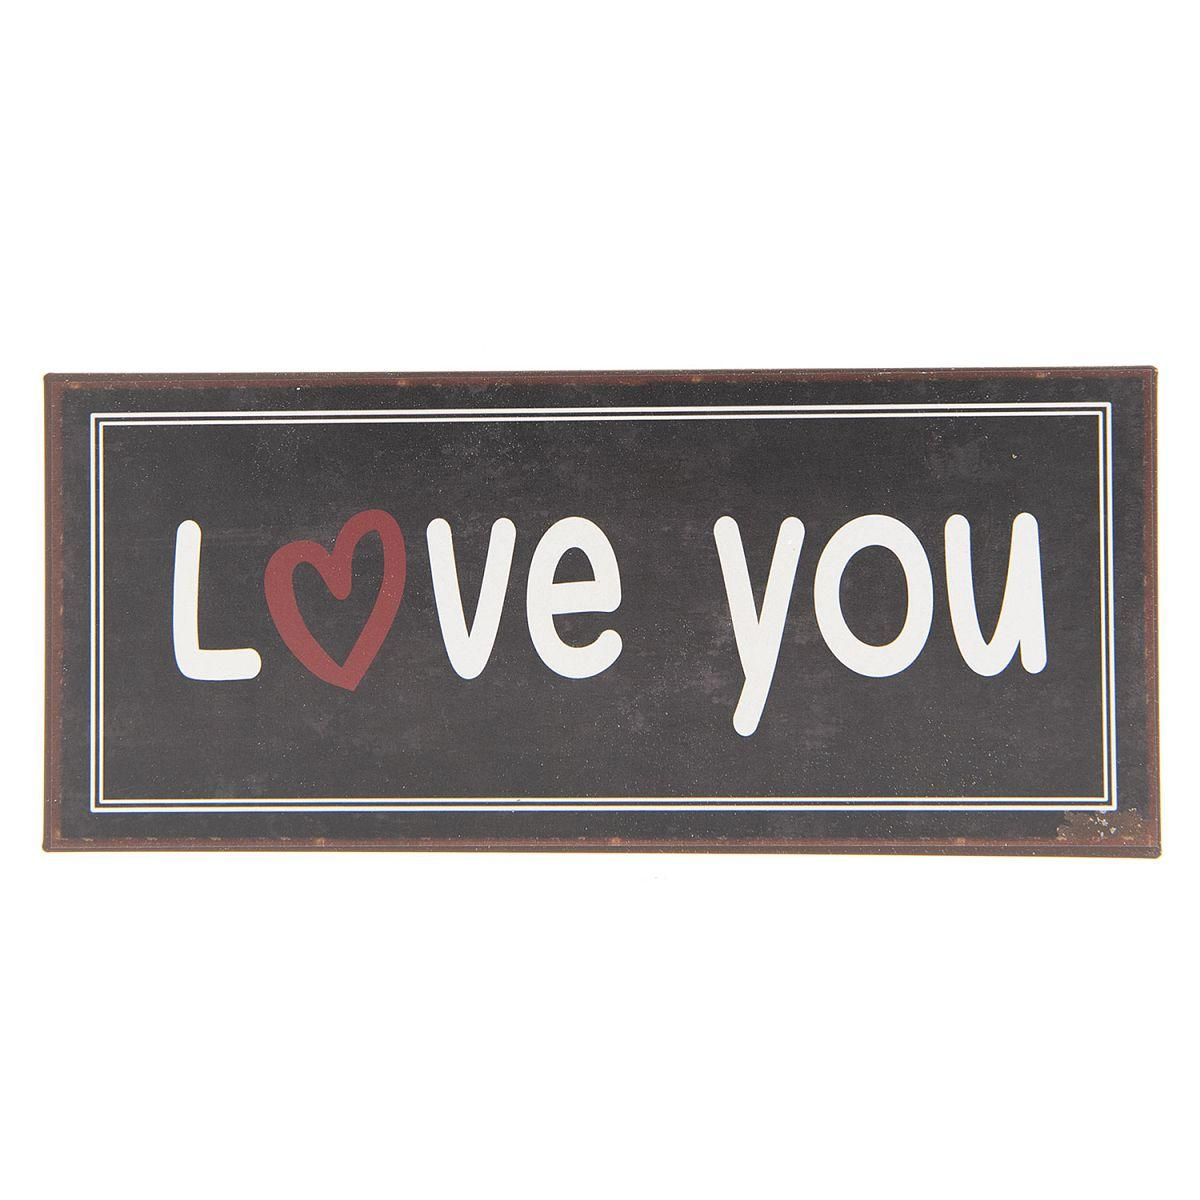 1- Plechová cedule LOVE YOU